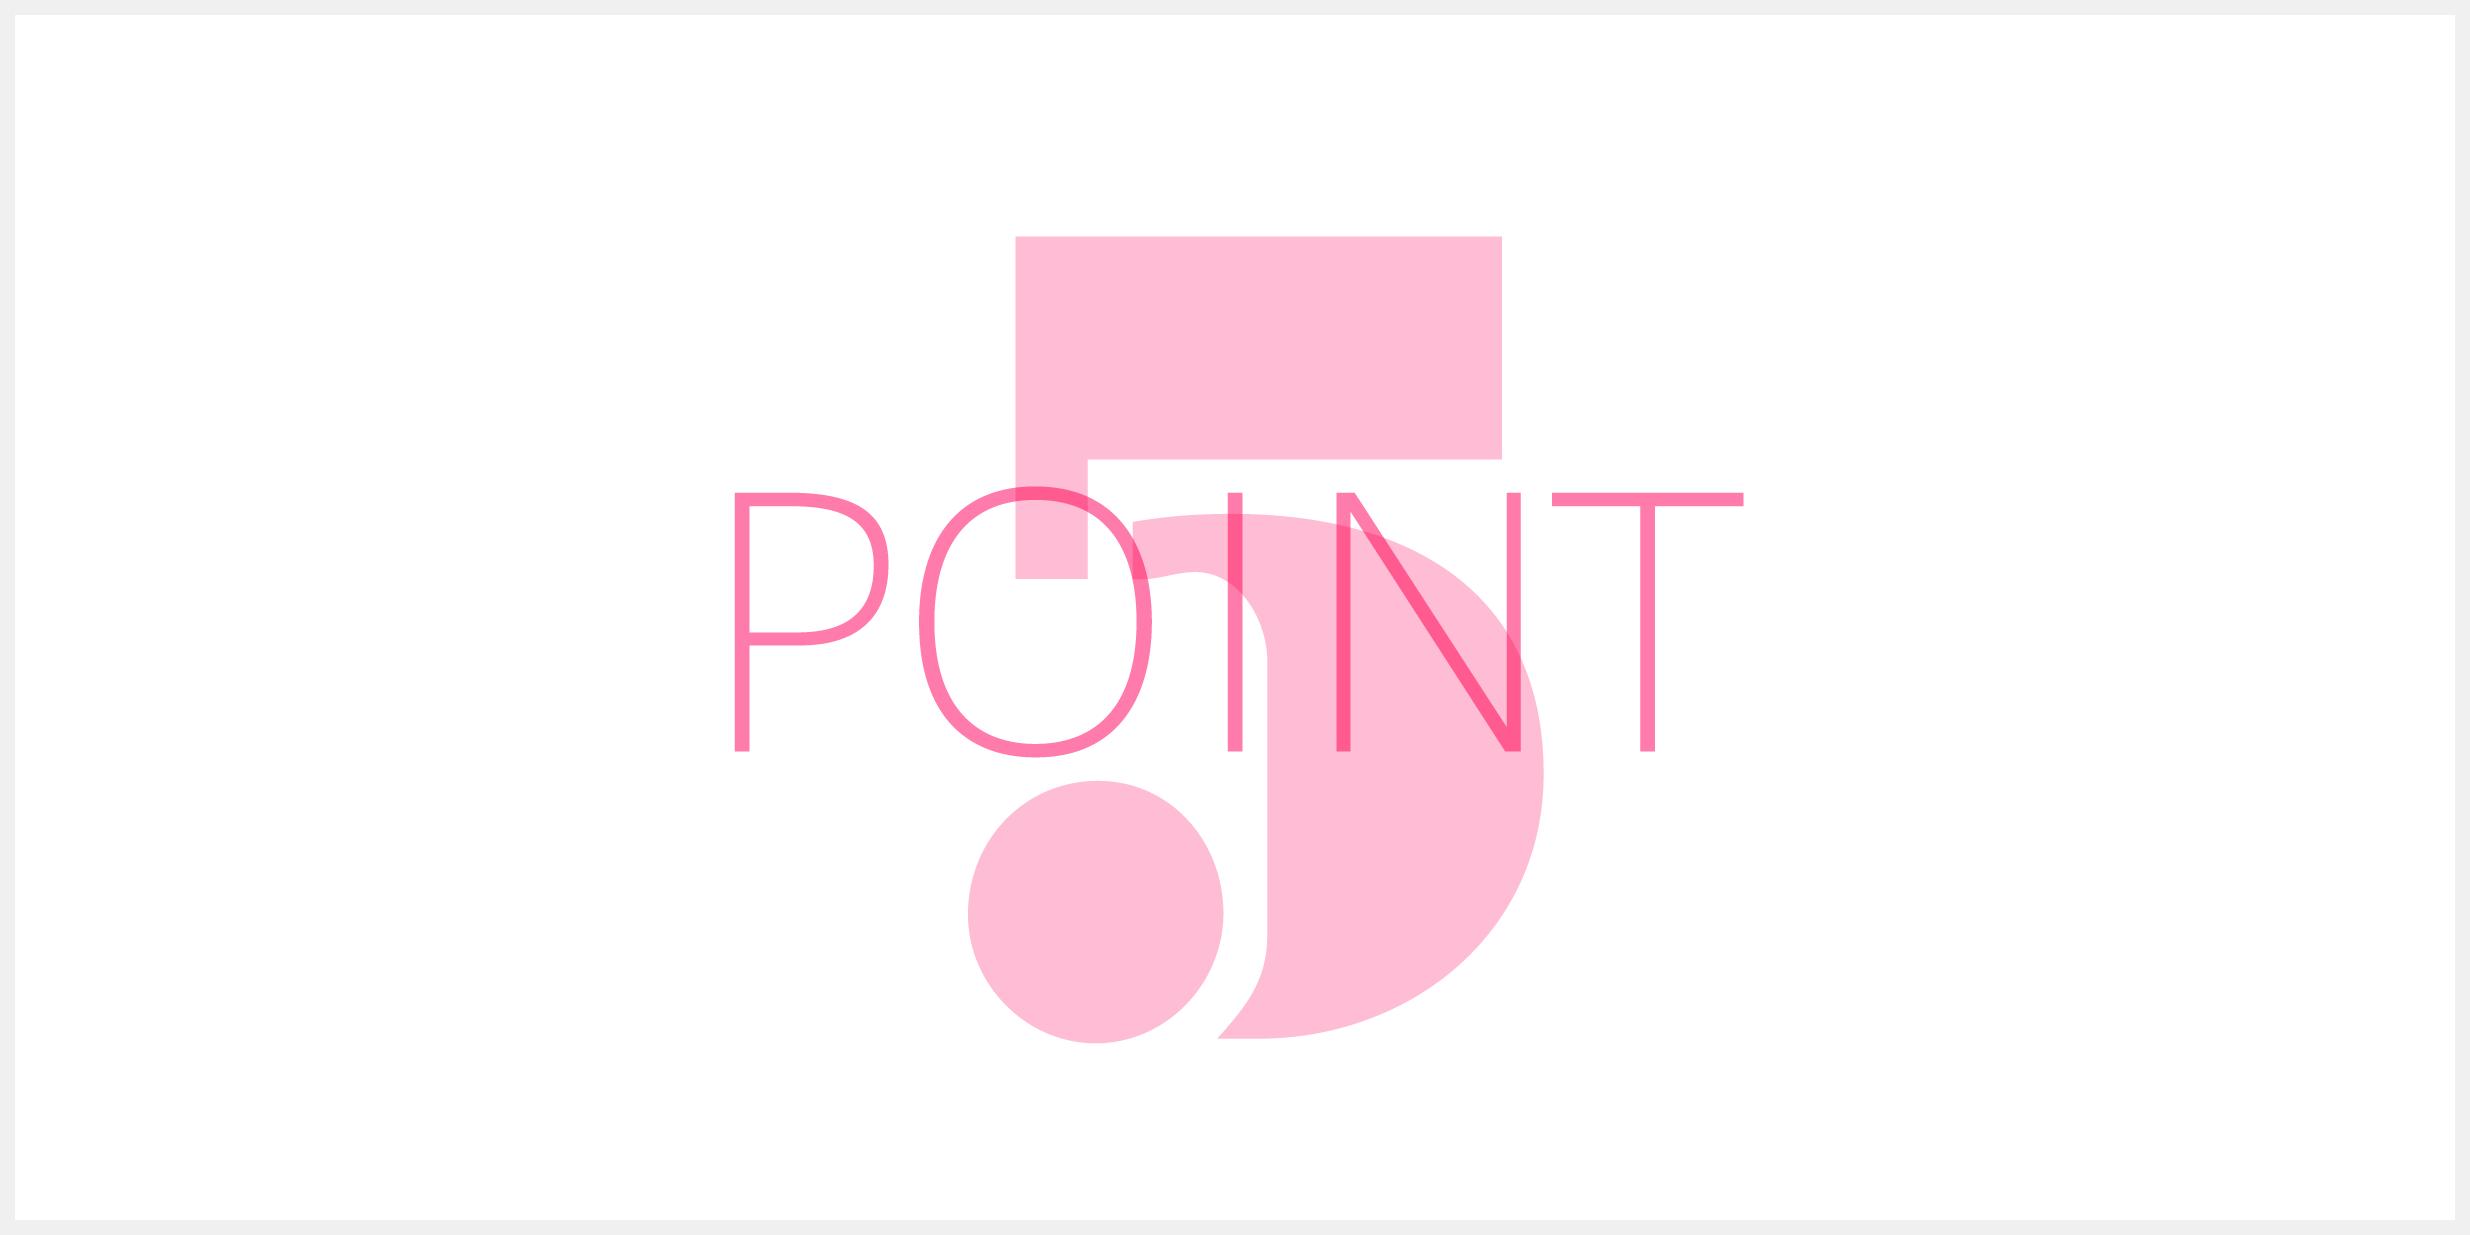 elephant,ポイント,point